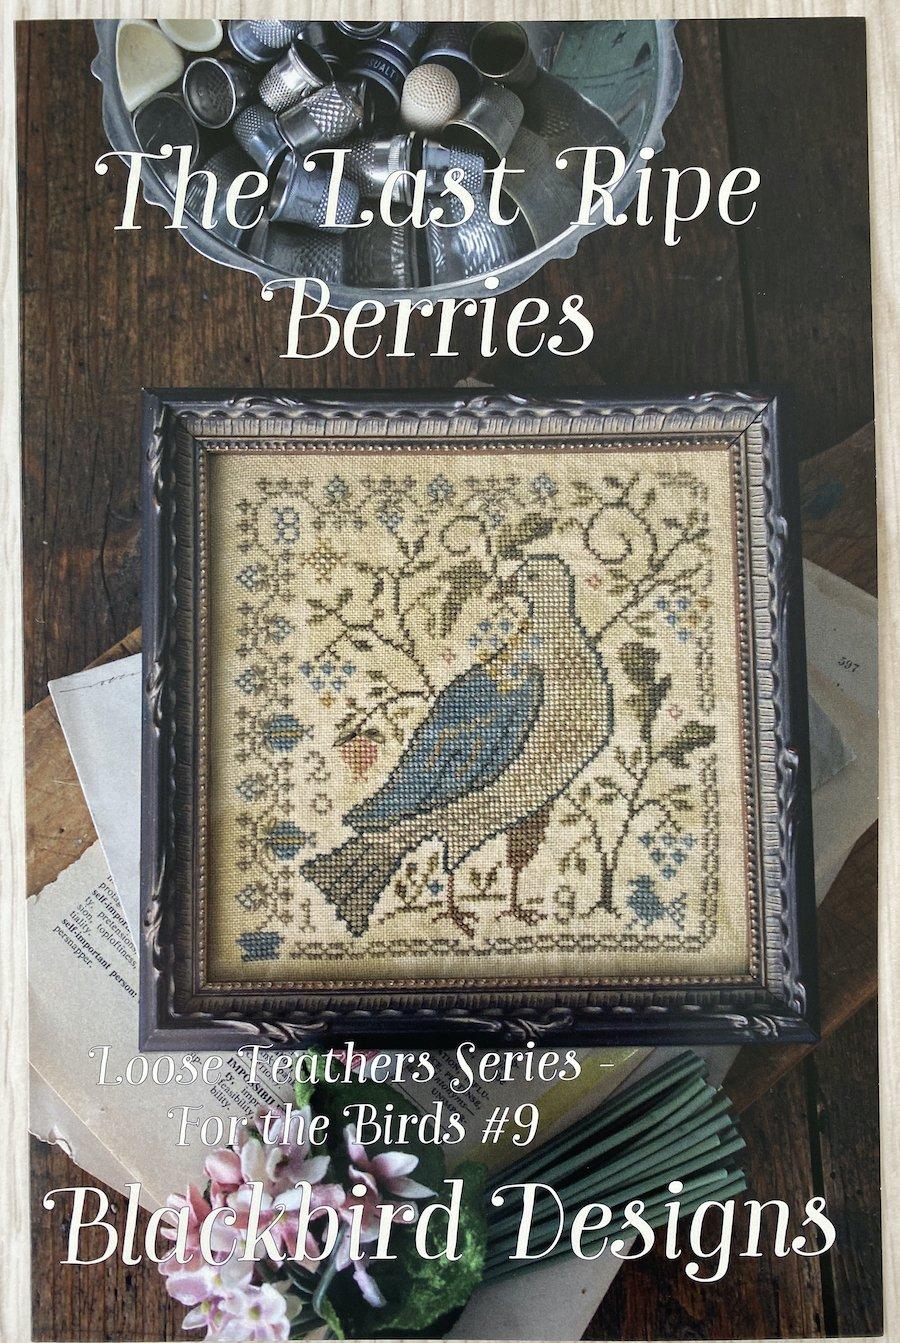 The Last Ripe Berries